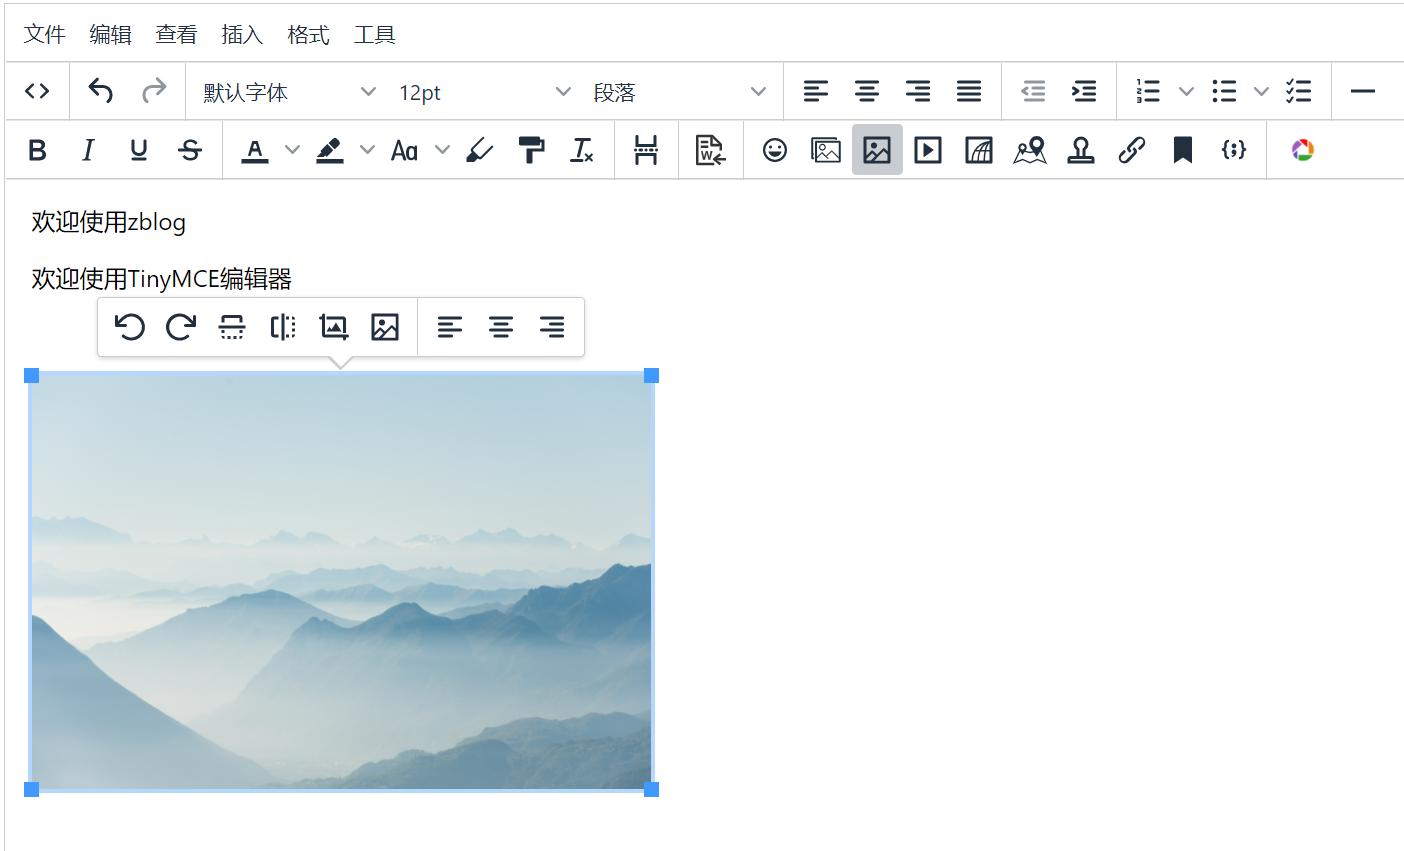 Zblog TinyMCE 富文本编辑器,zblog,第1张